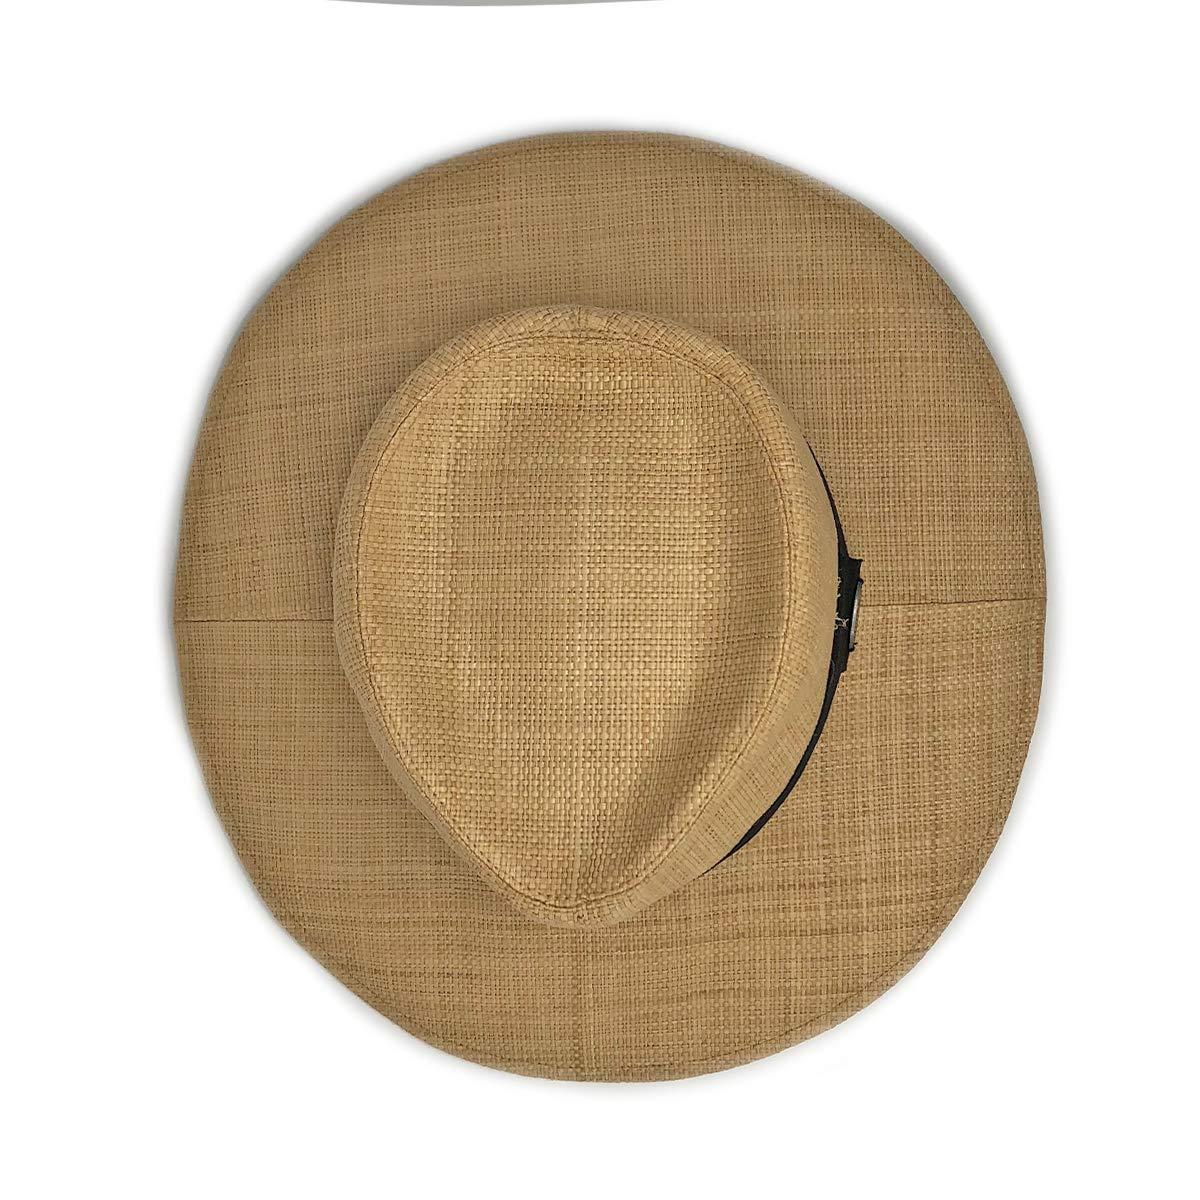 Wallaroo Hat Company Women's Morgan Fedora - Natural - UPF 50+, Modern Style by Wallaroo Hat Company (Image #3)